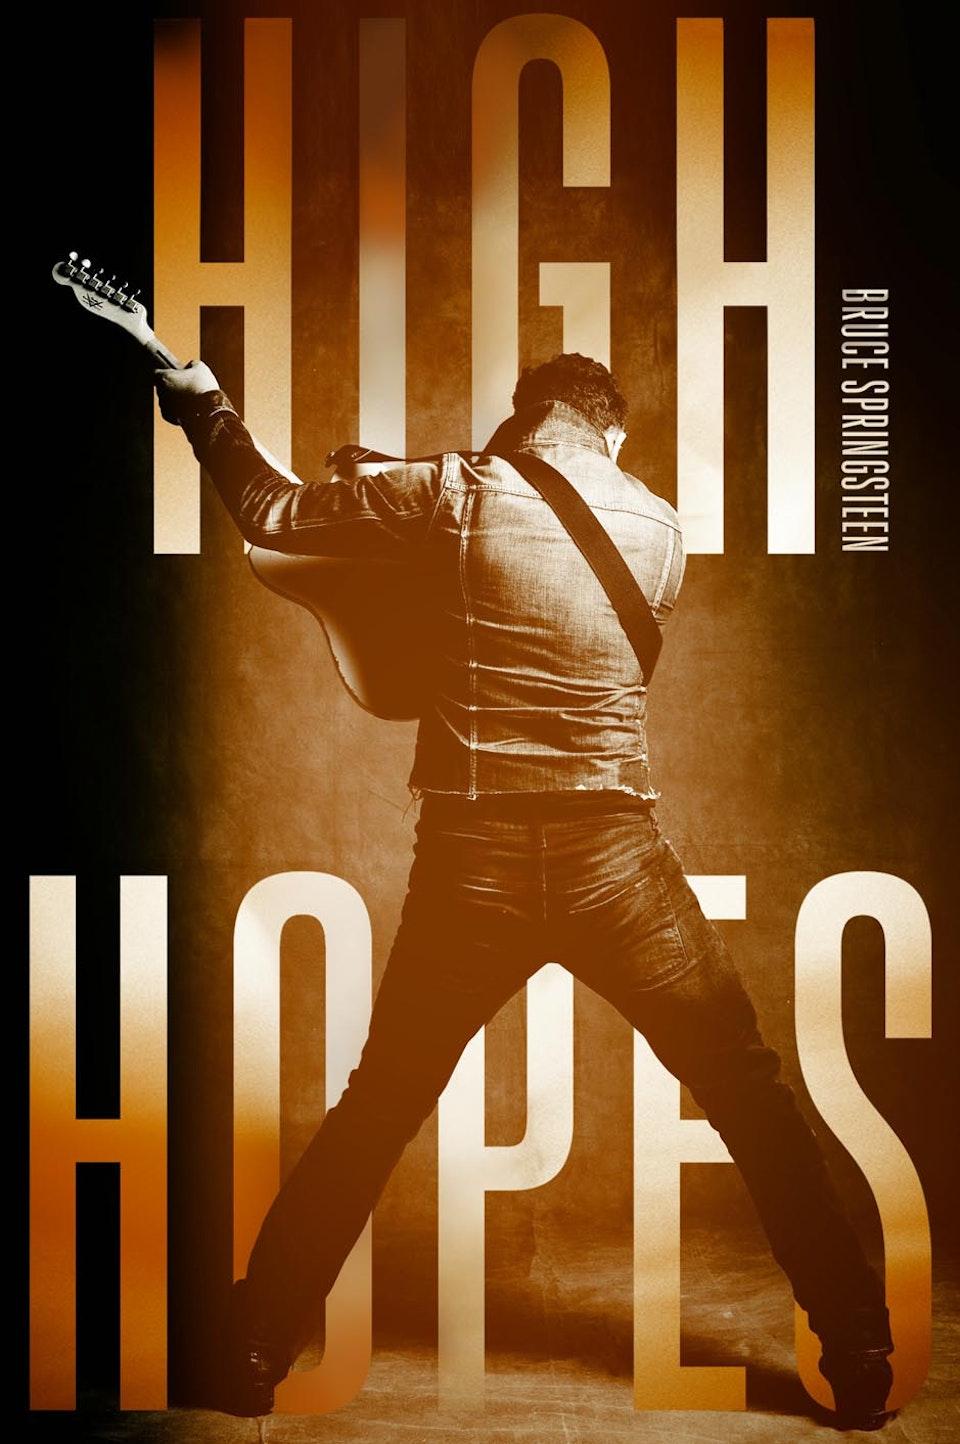 High Hopes - Campaign art